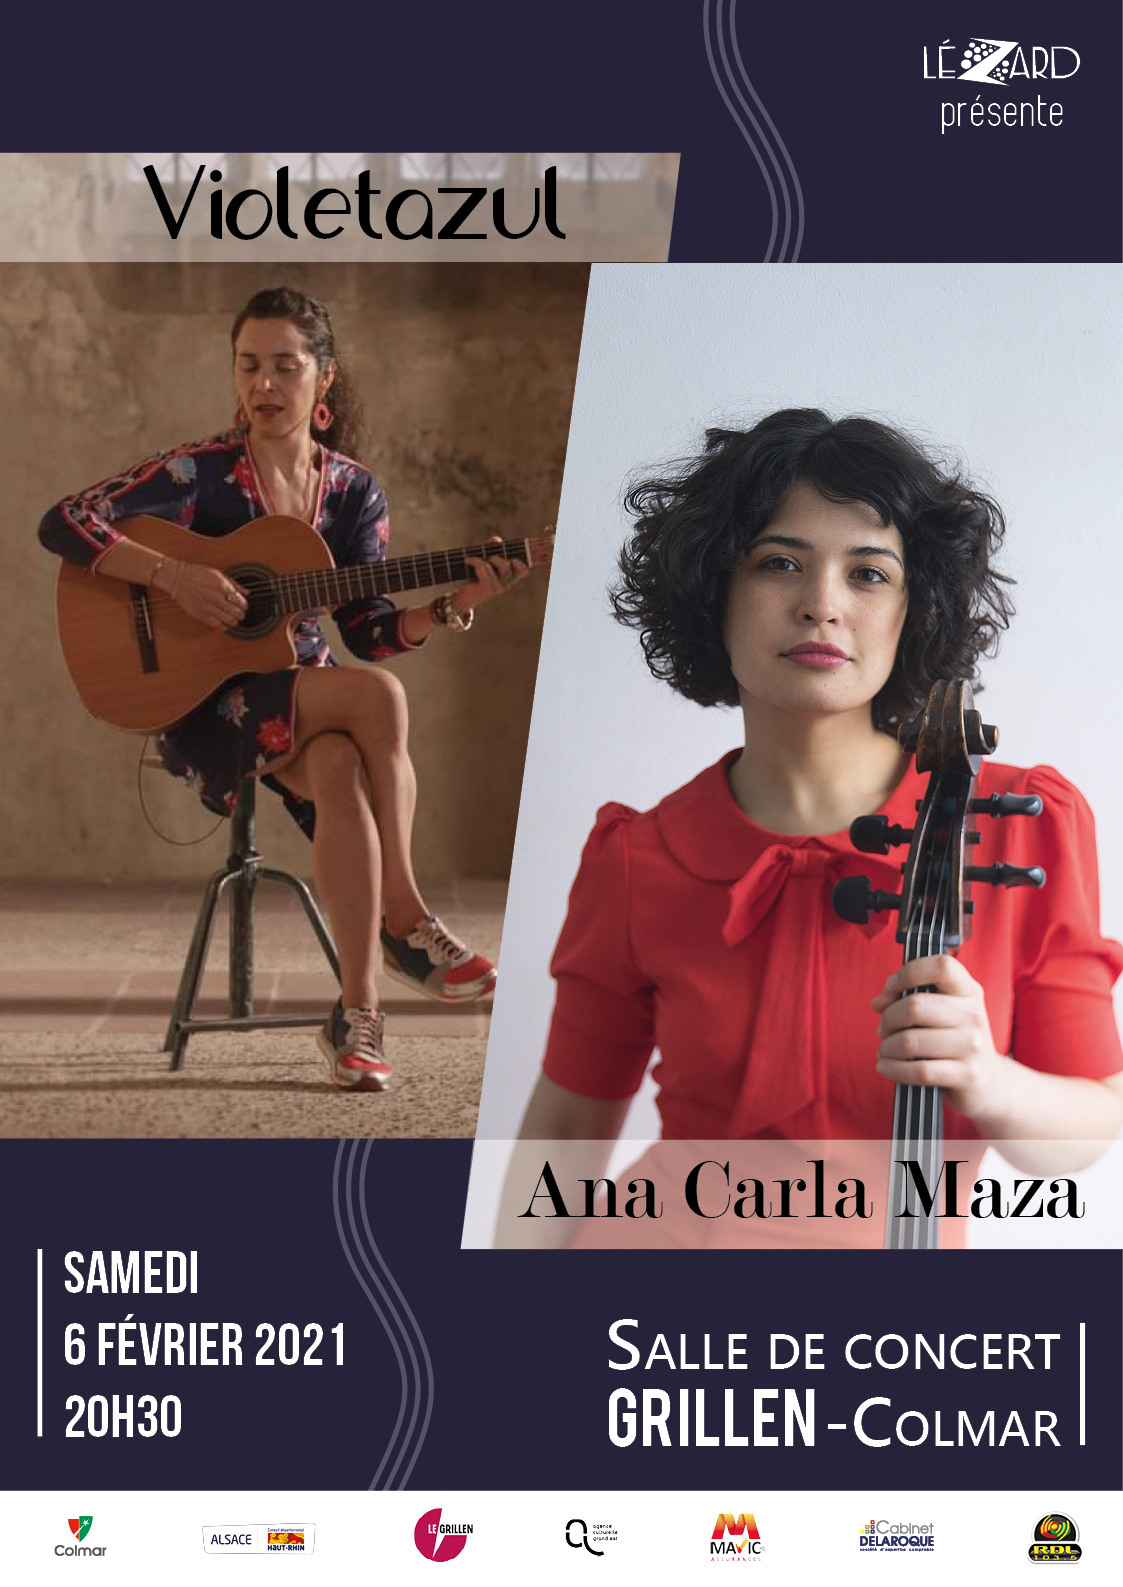 concert Violetazul et Ana Carla Maza